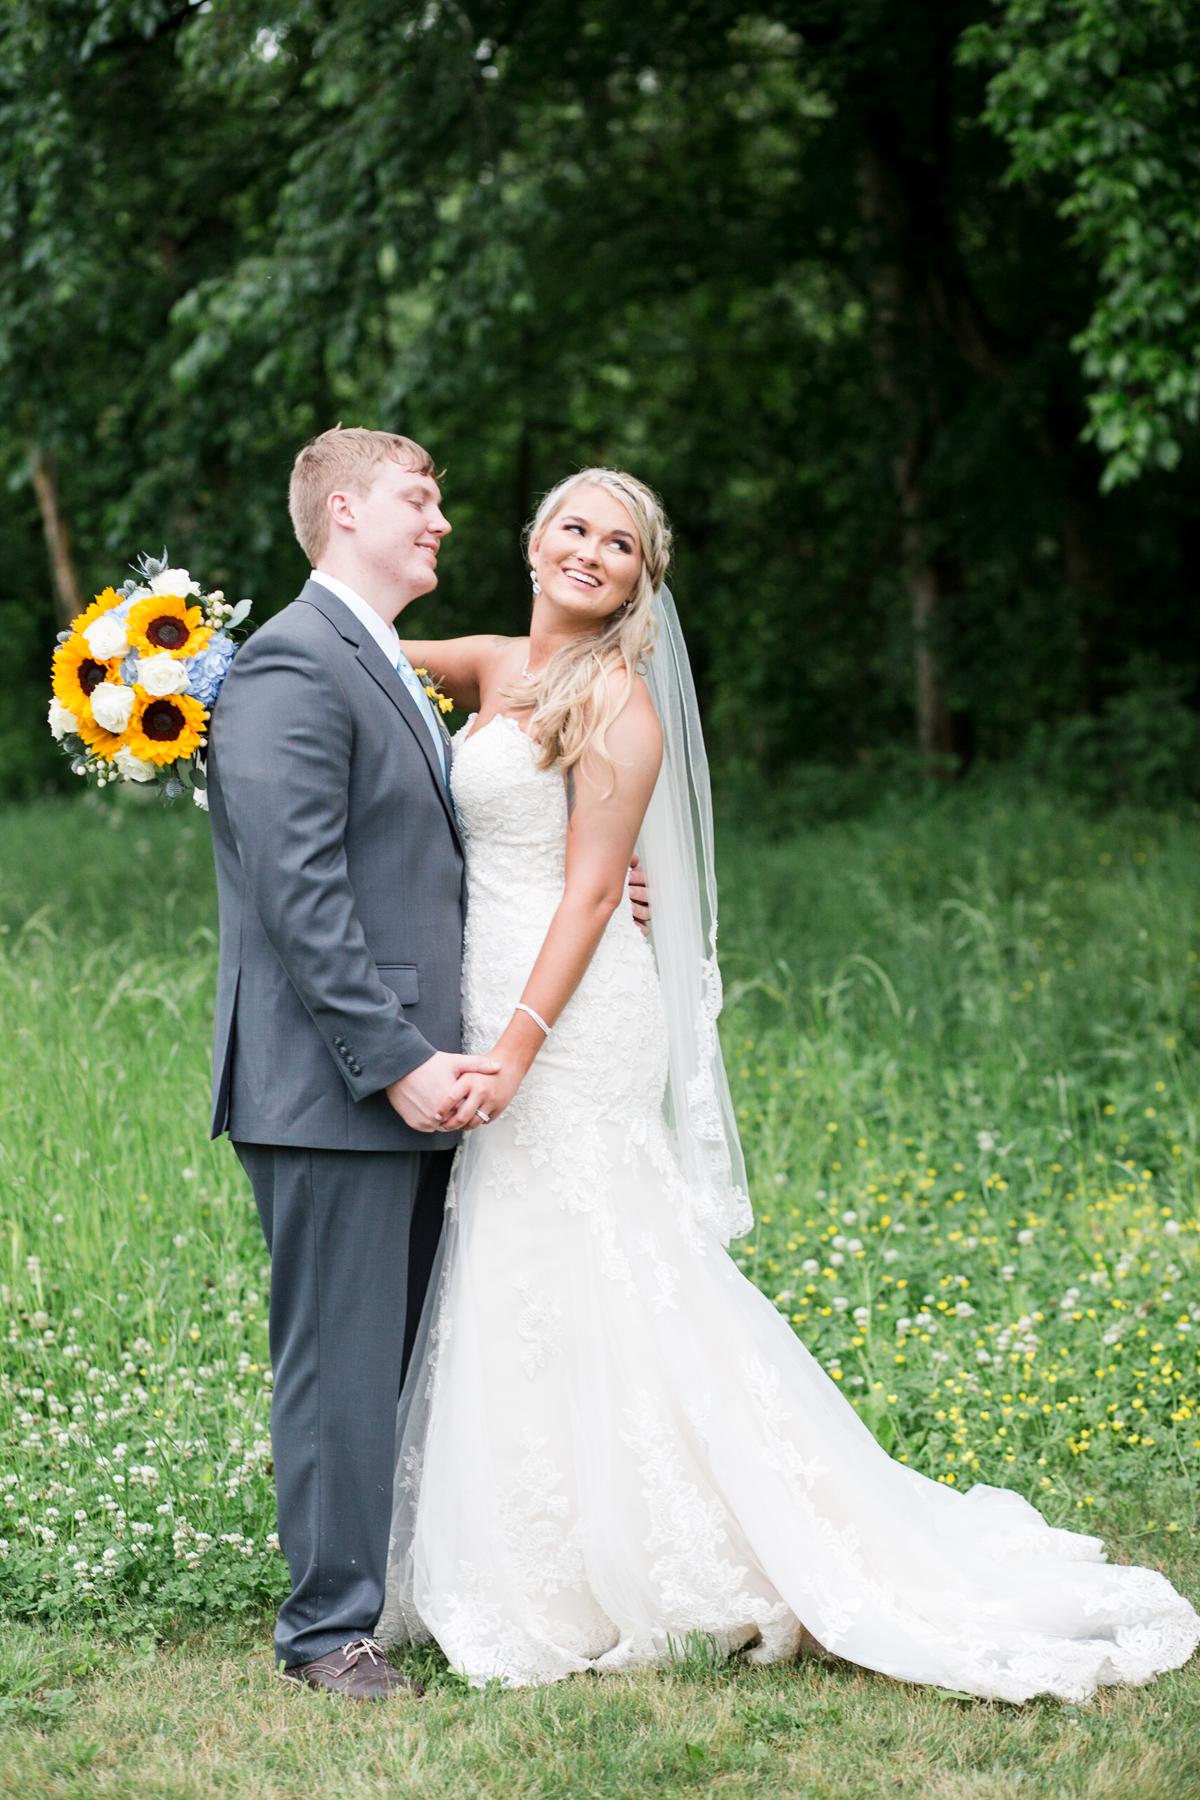 The-venue-at-white-oak-farms-wedding-nashville-wedding-photographers-0282.jpg